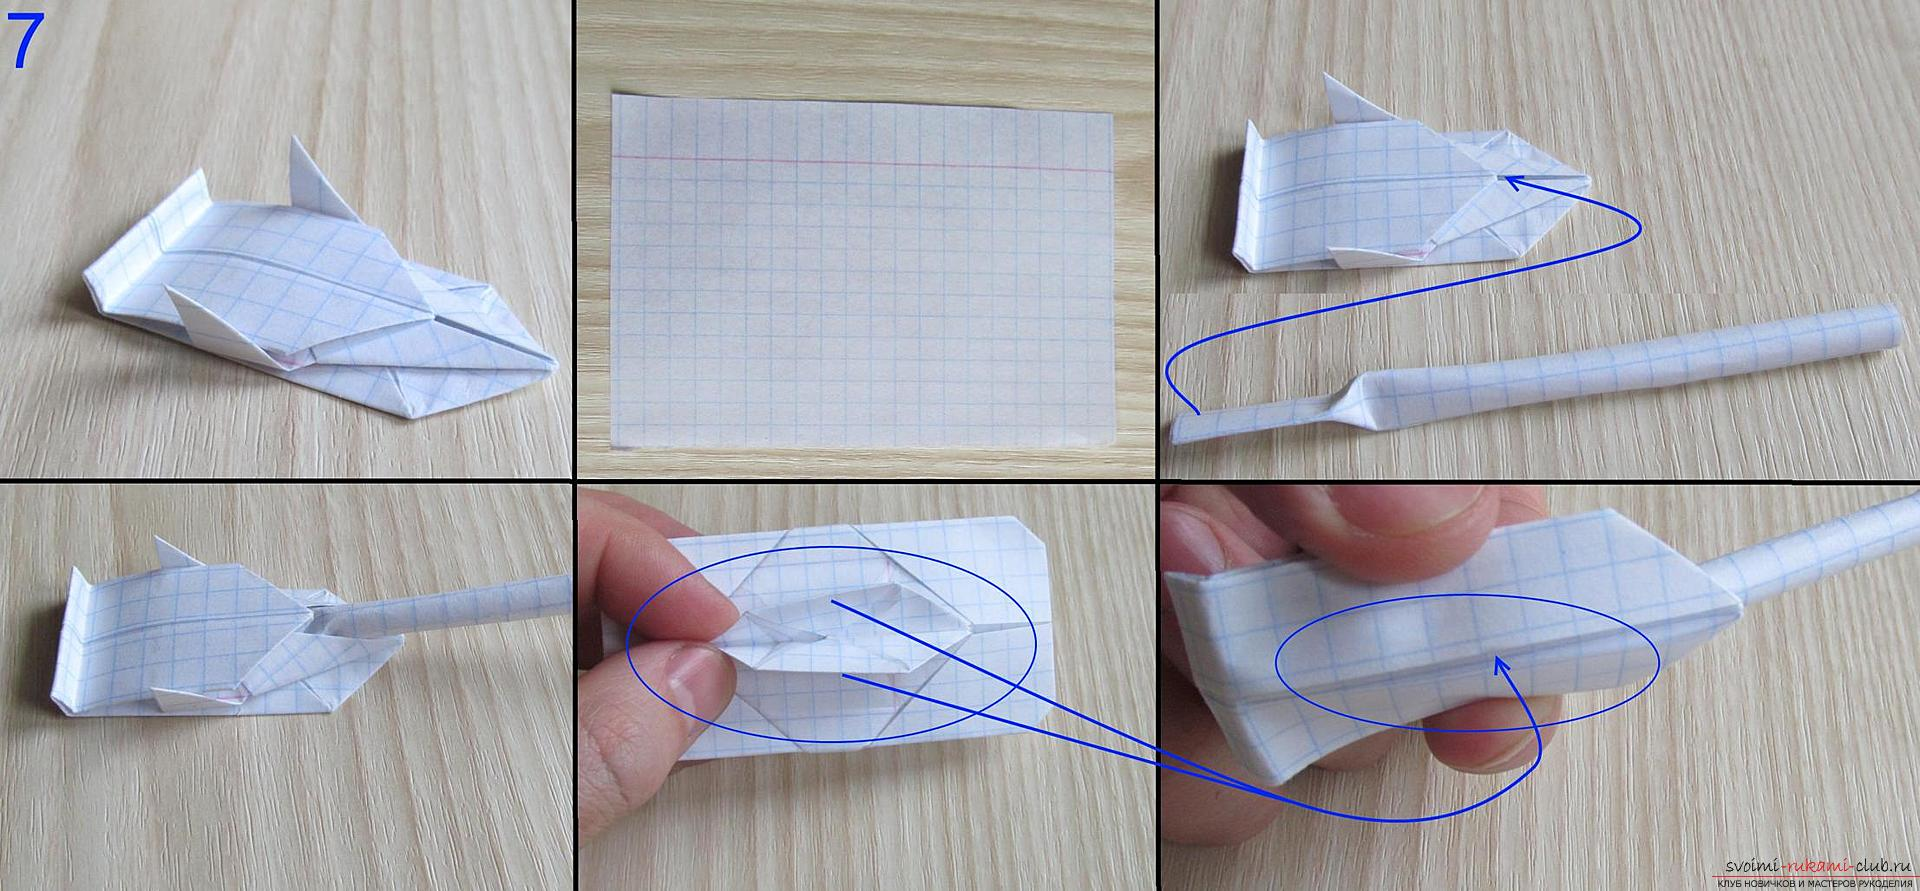 чертеж из бумаги титаник схема сборки